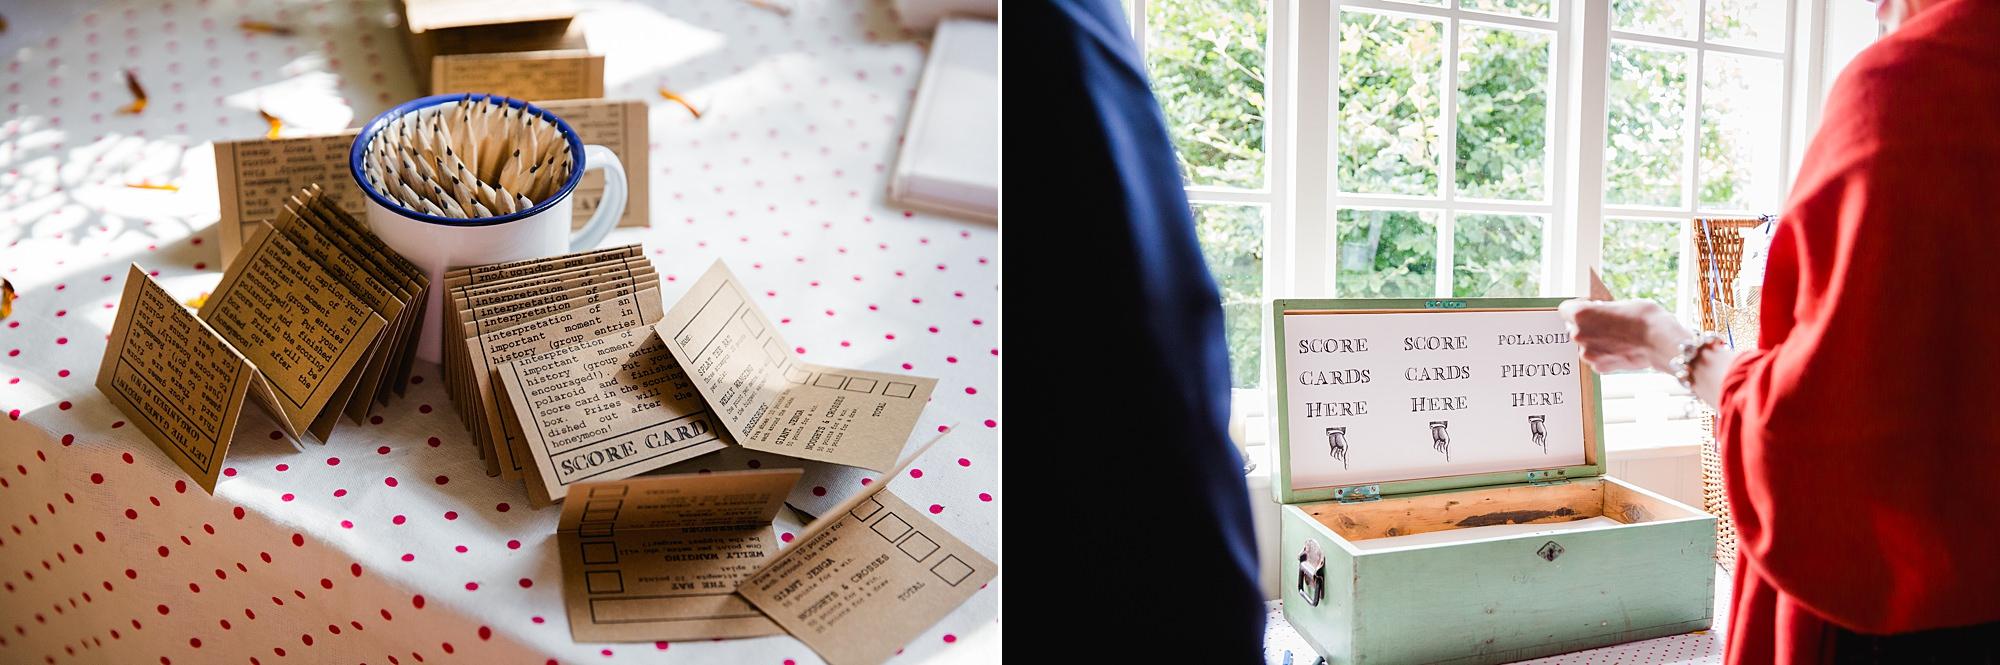 Fun village hall wedding DIY game scorecards